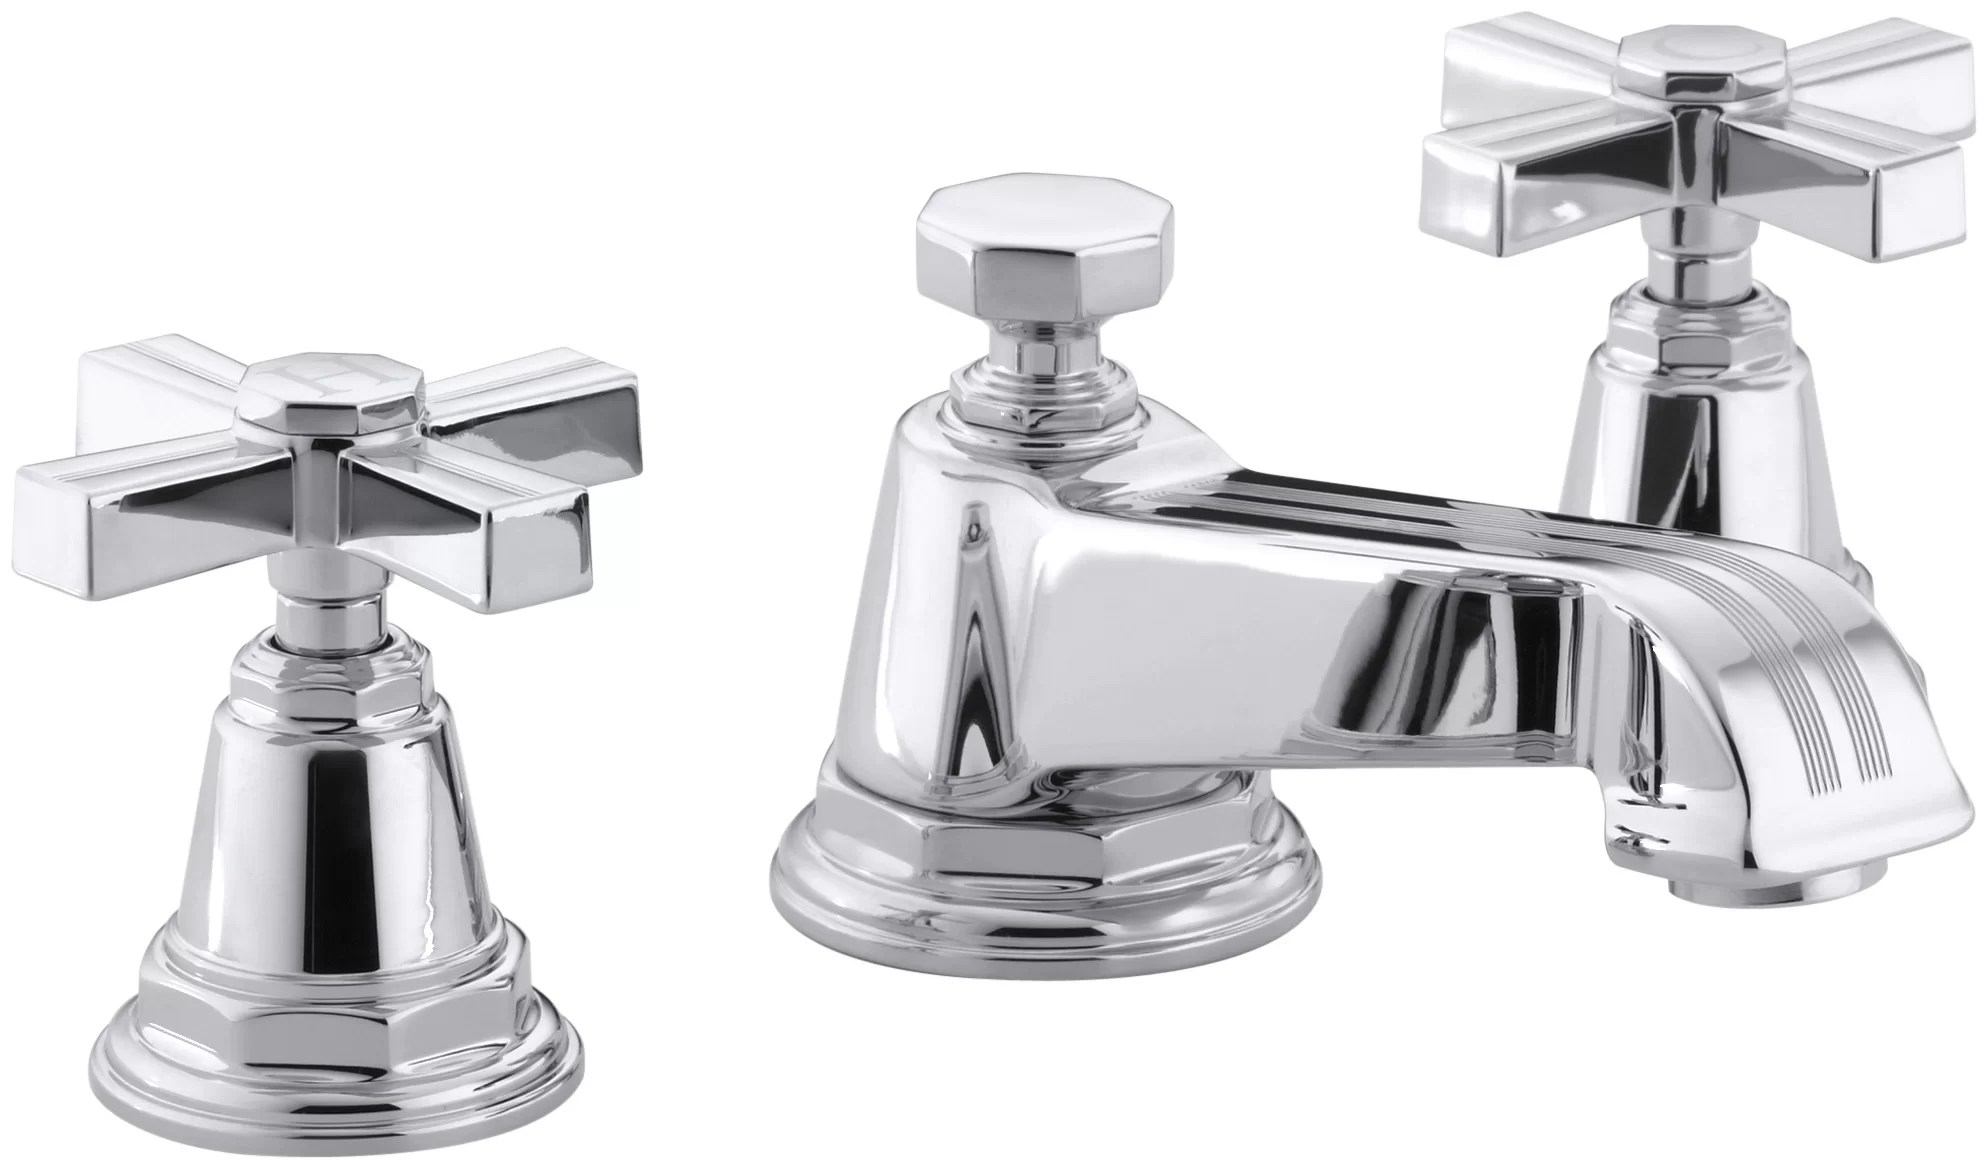 pinstripe widespread bathroom faucet with cross handles